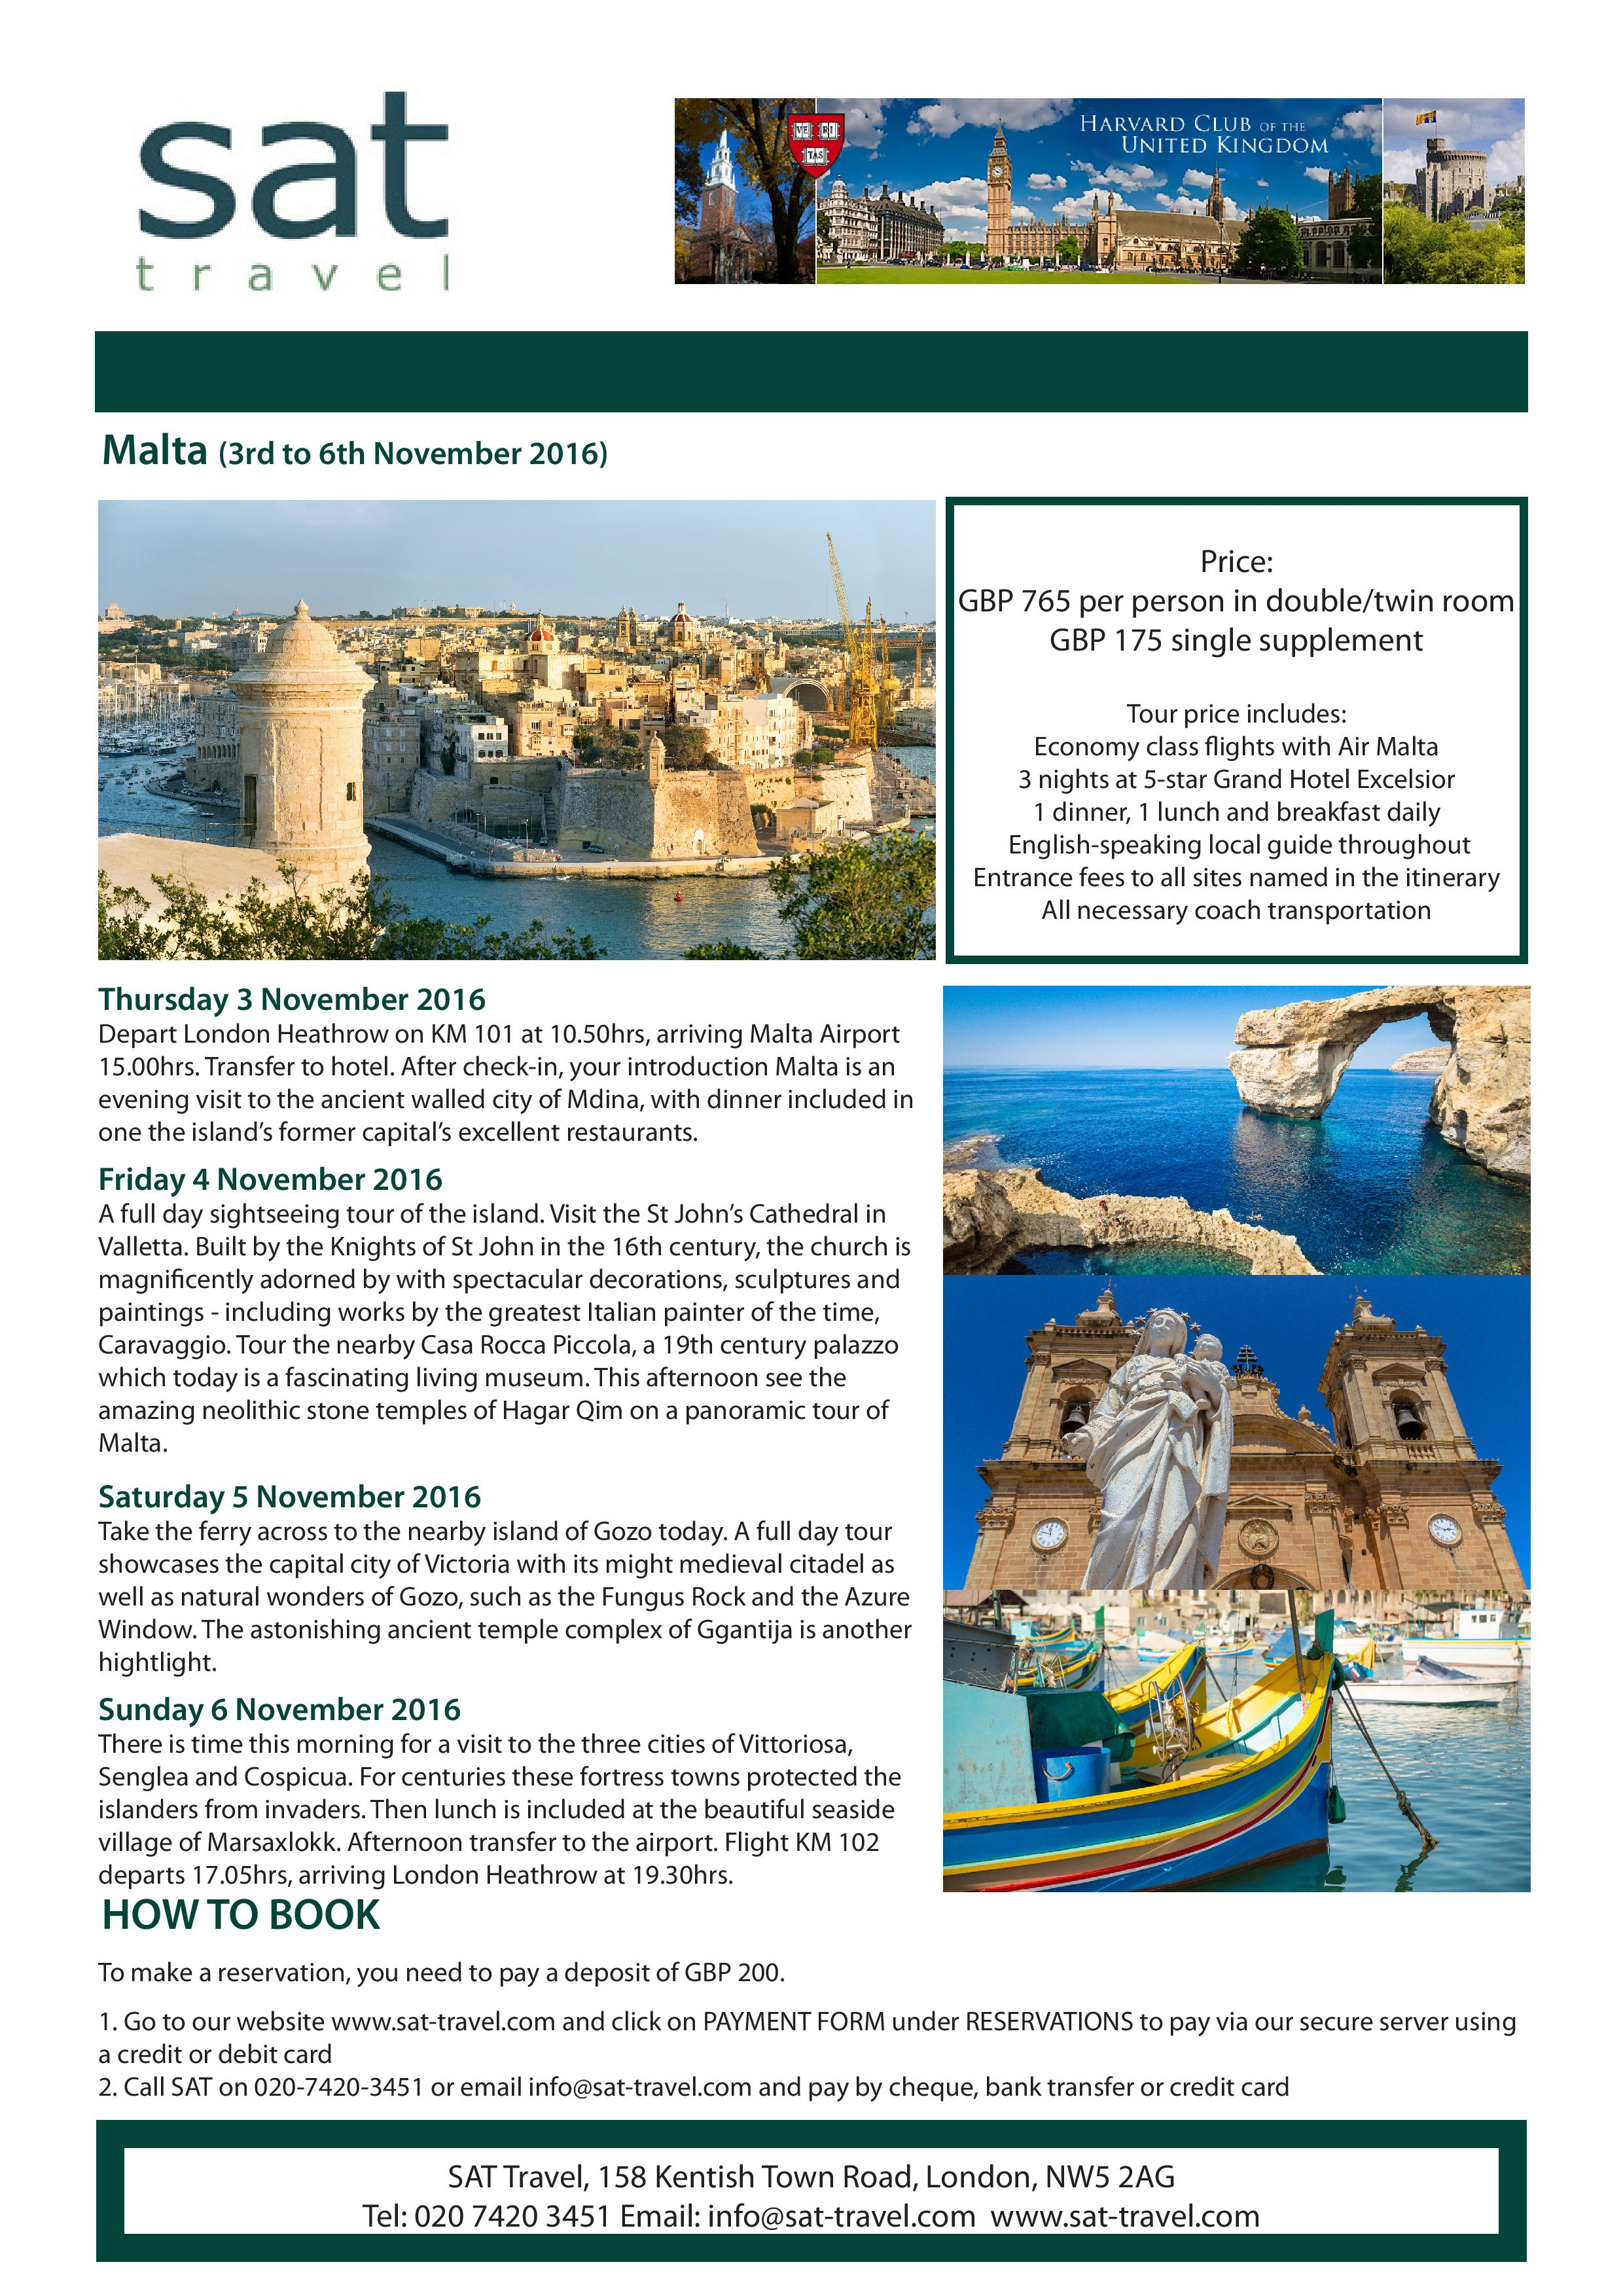 hcuk-malta-itinerary-v.3-page-001